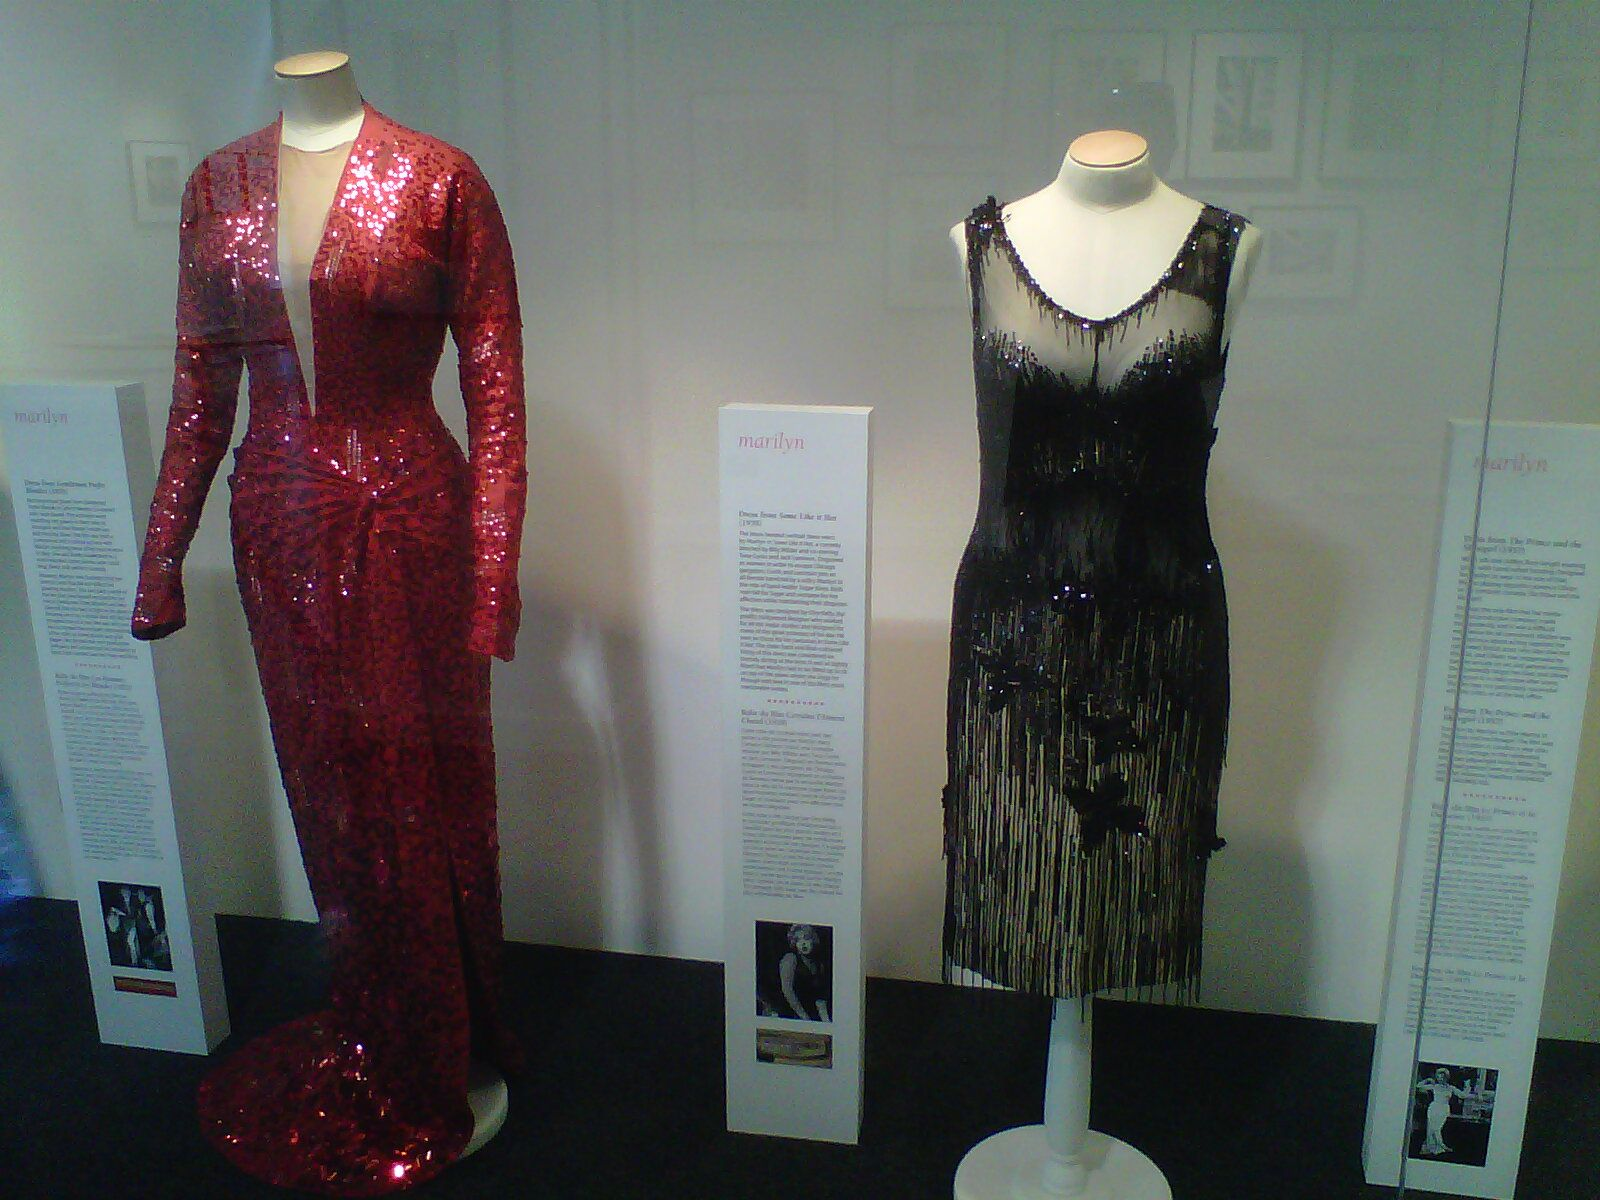 Undergarments for lace wedding dress  Ms Monroe Exhibition London  ApplebyAve  Pinterest  Exhibitions